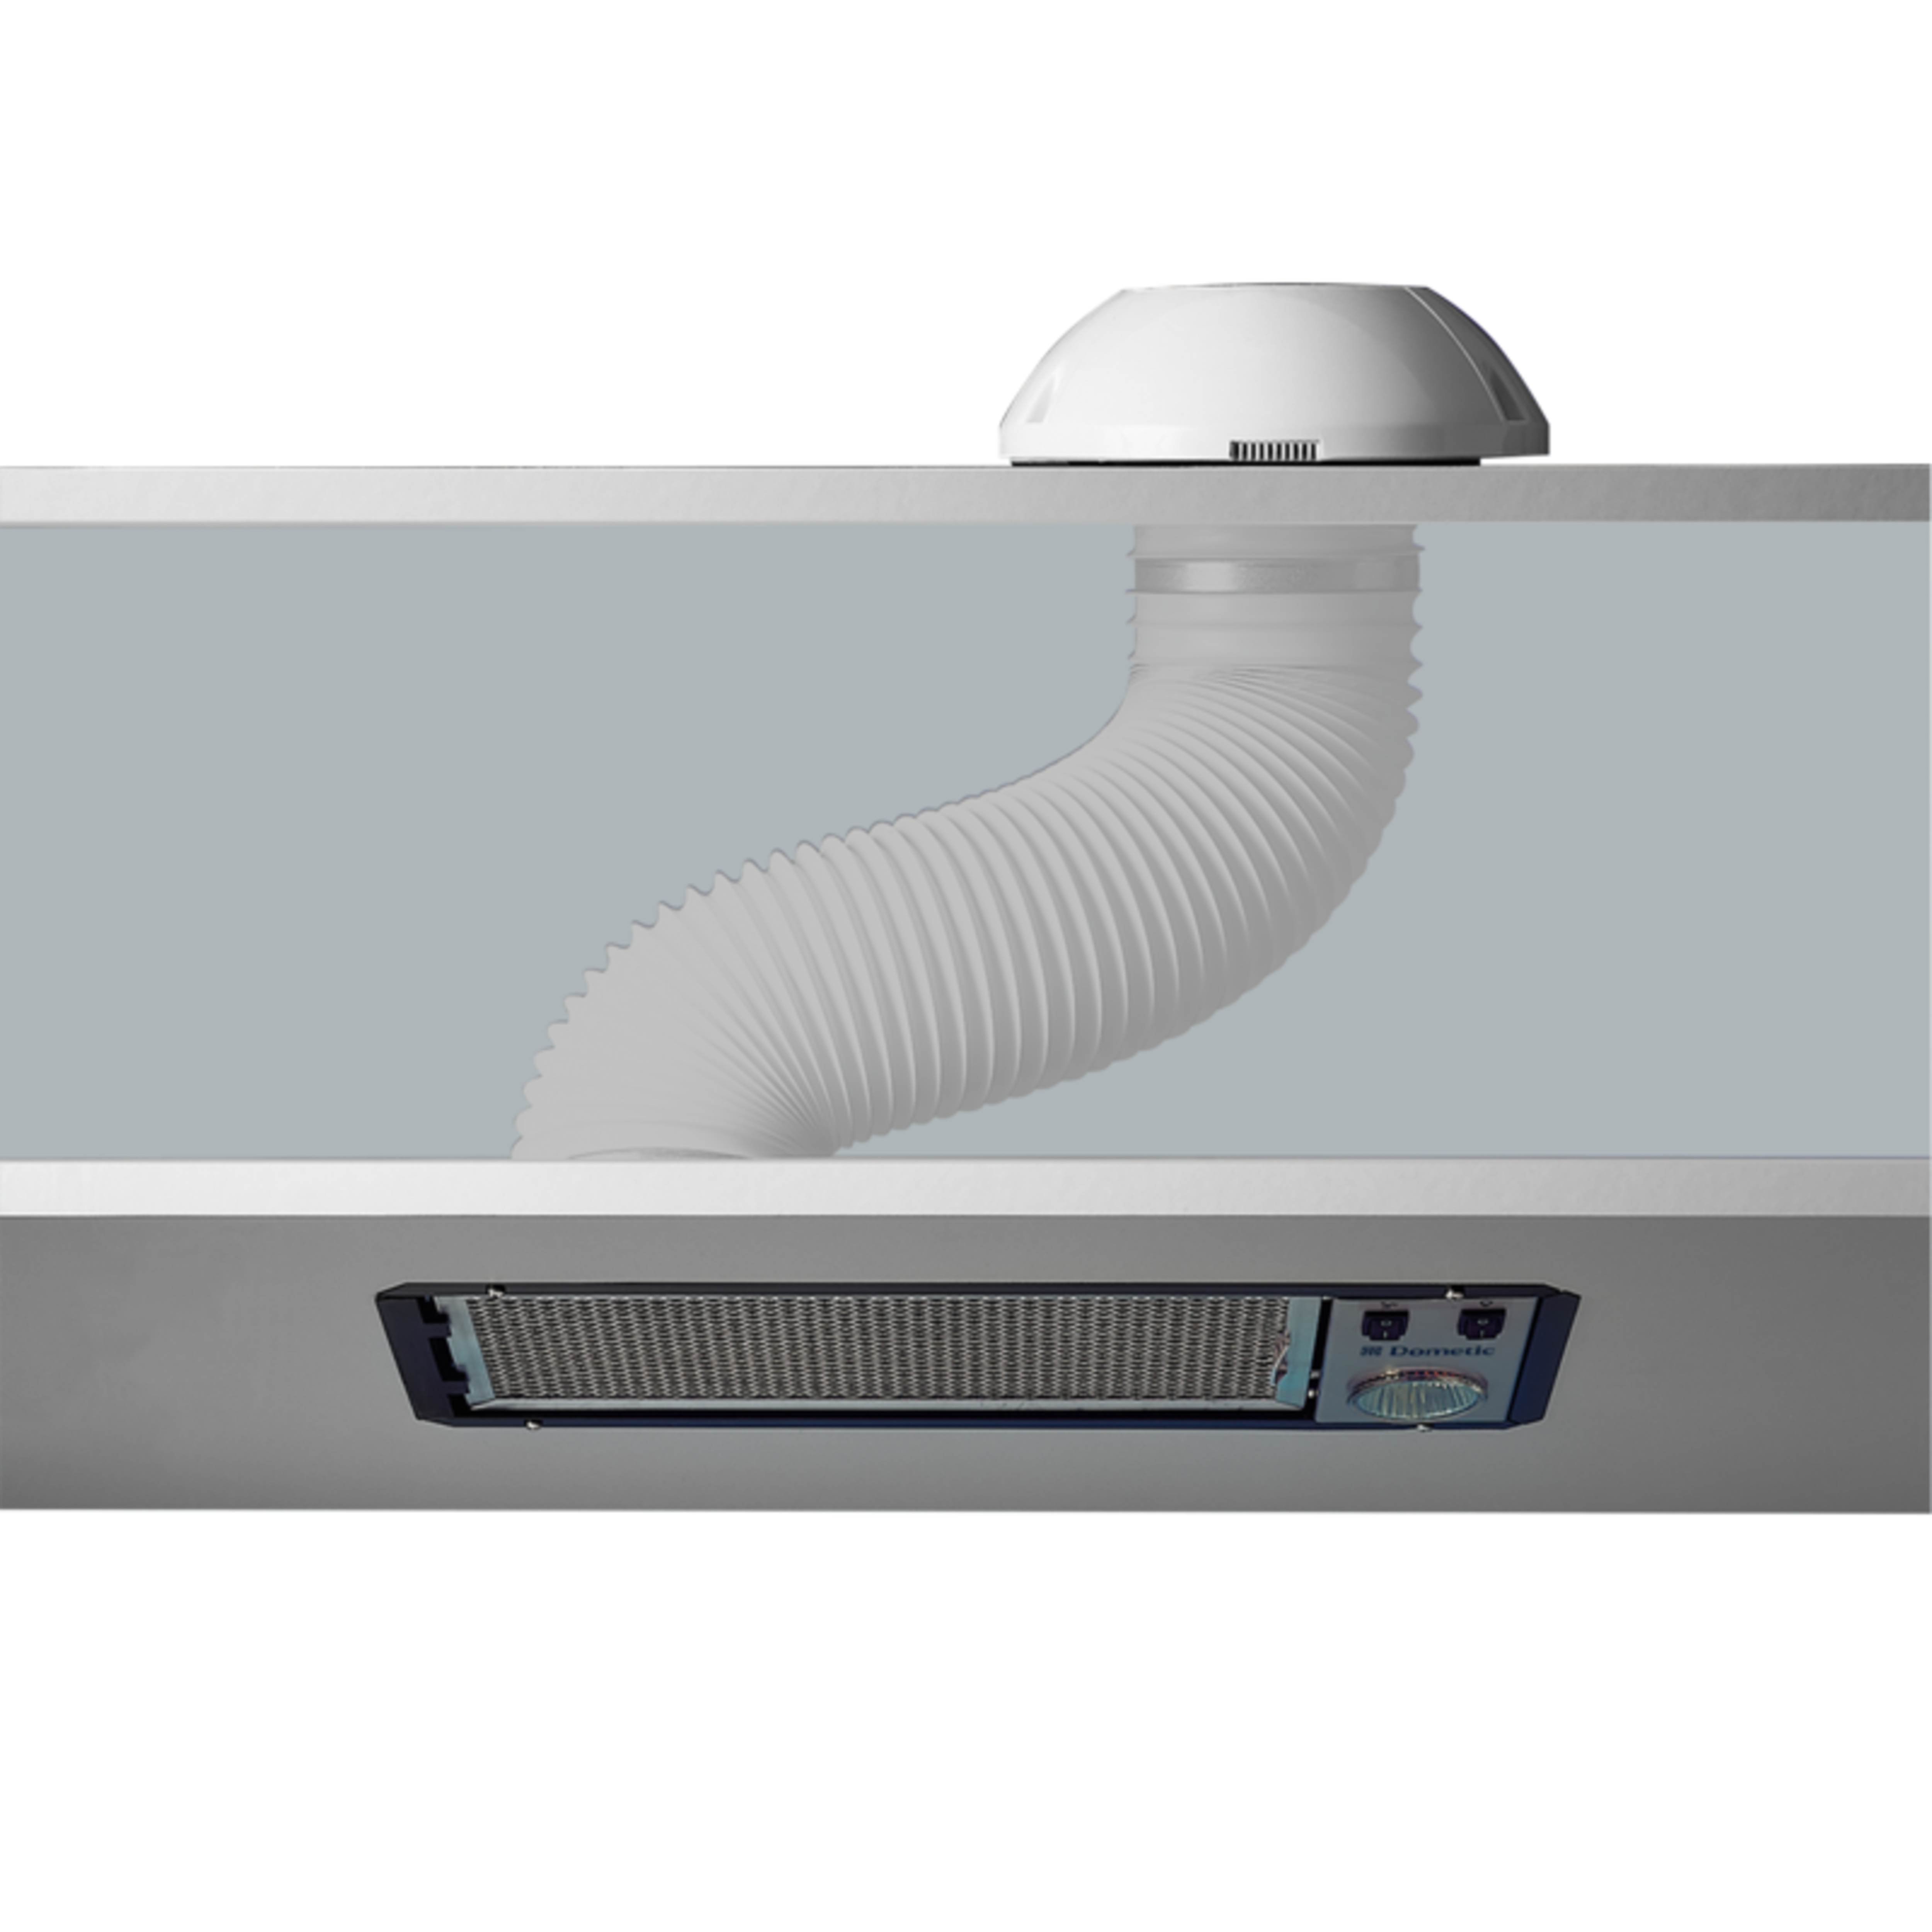 Effektiv ventilator med én hastighed